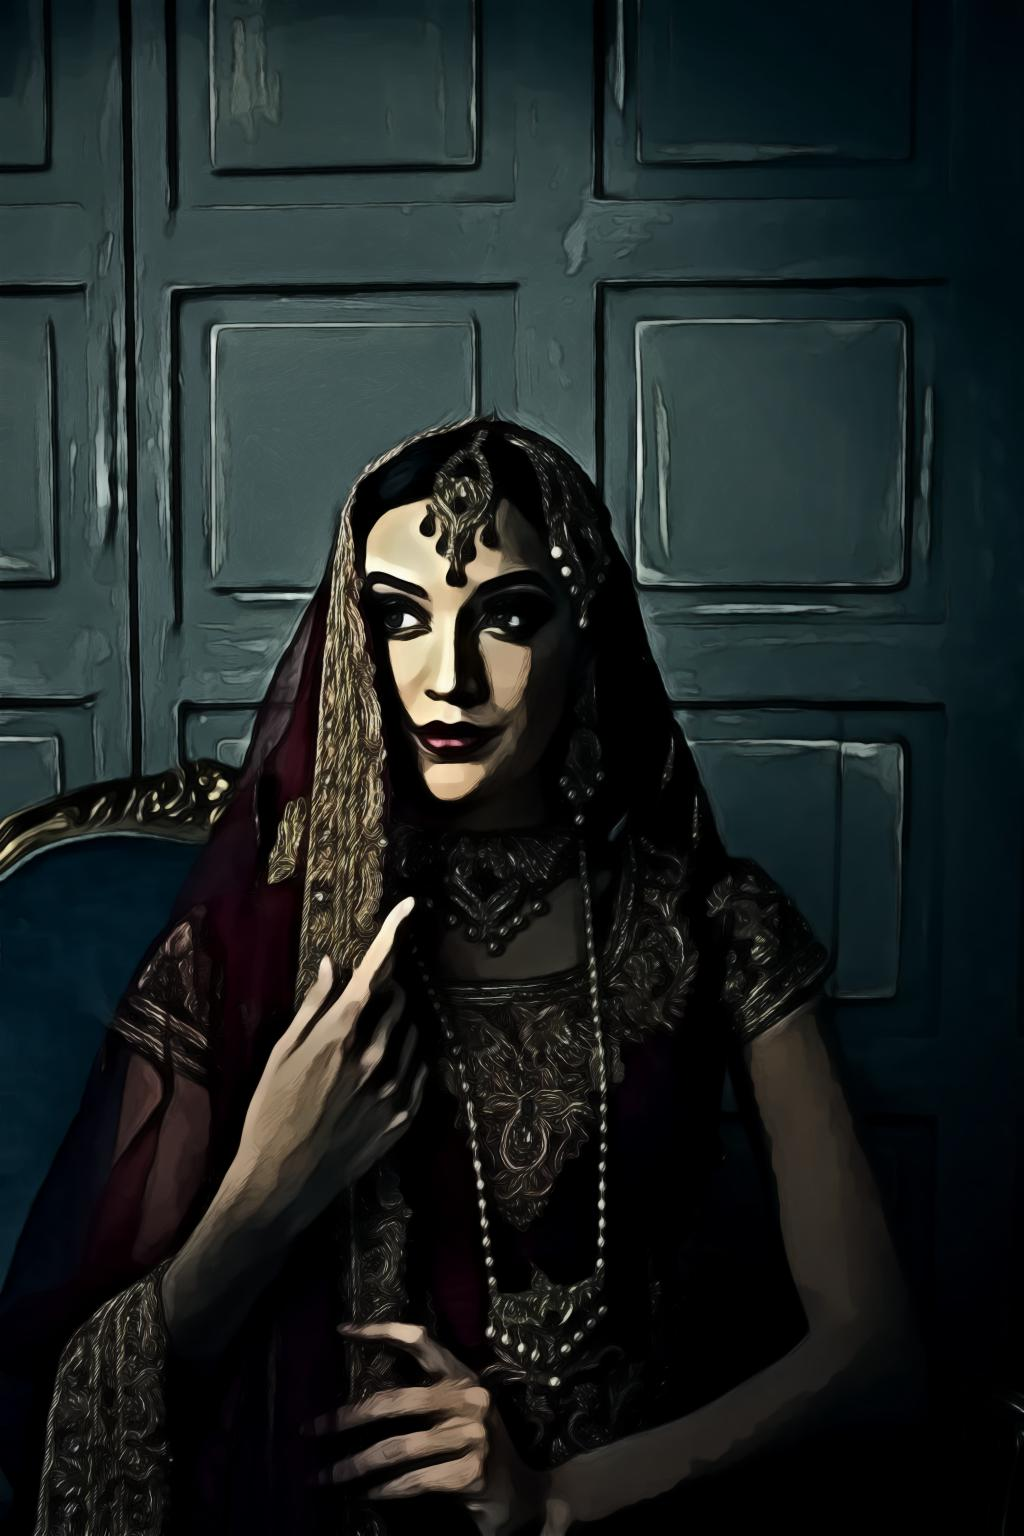 Portrait of woman wearing red sari